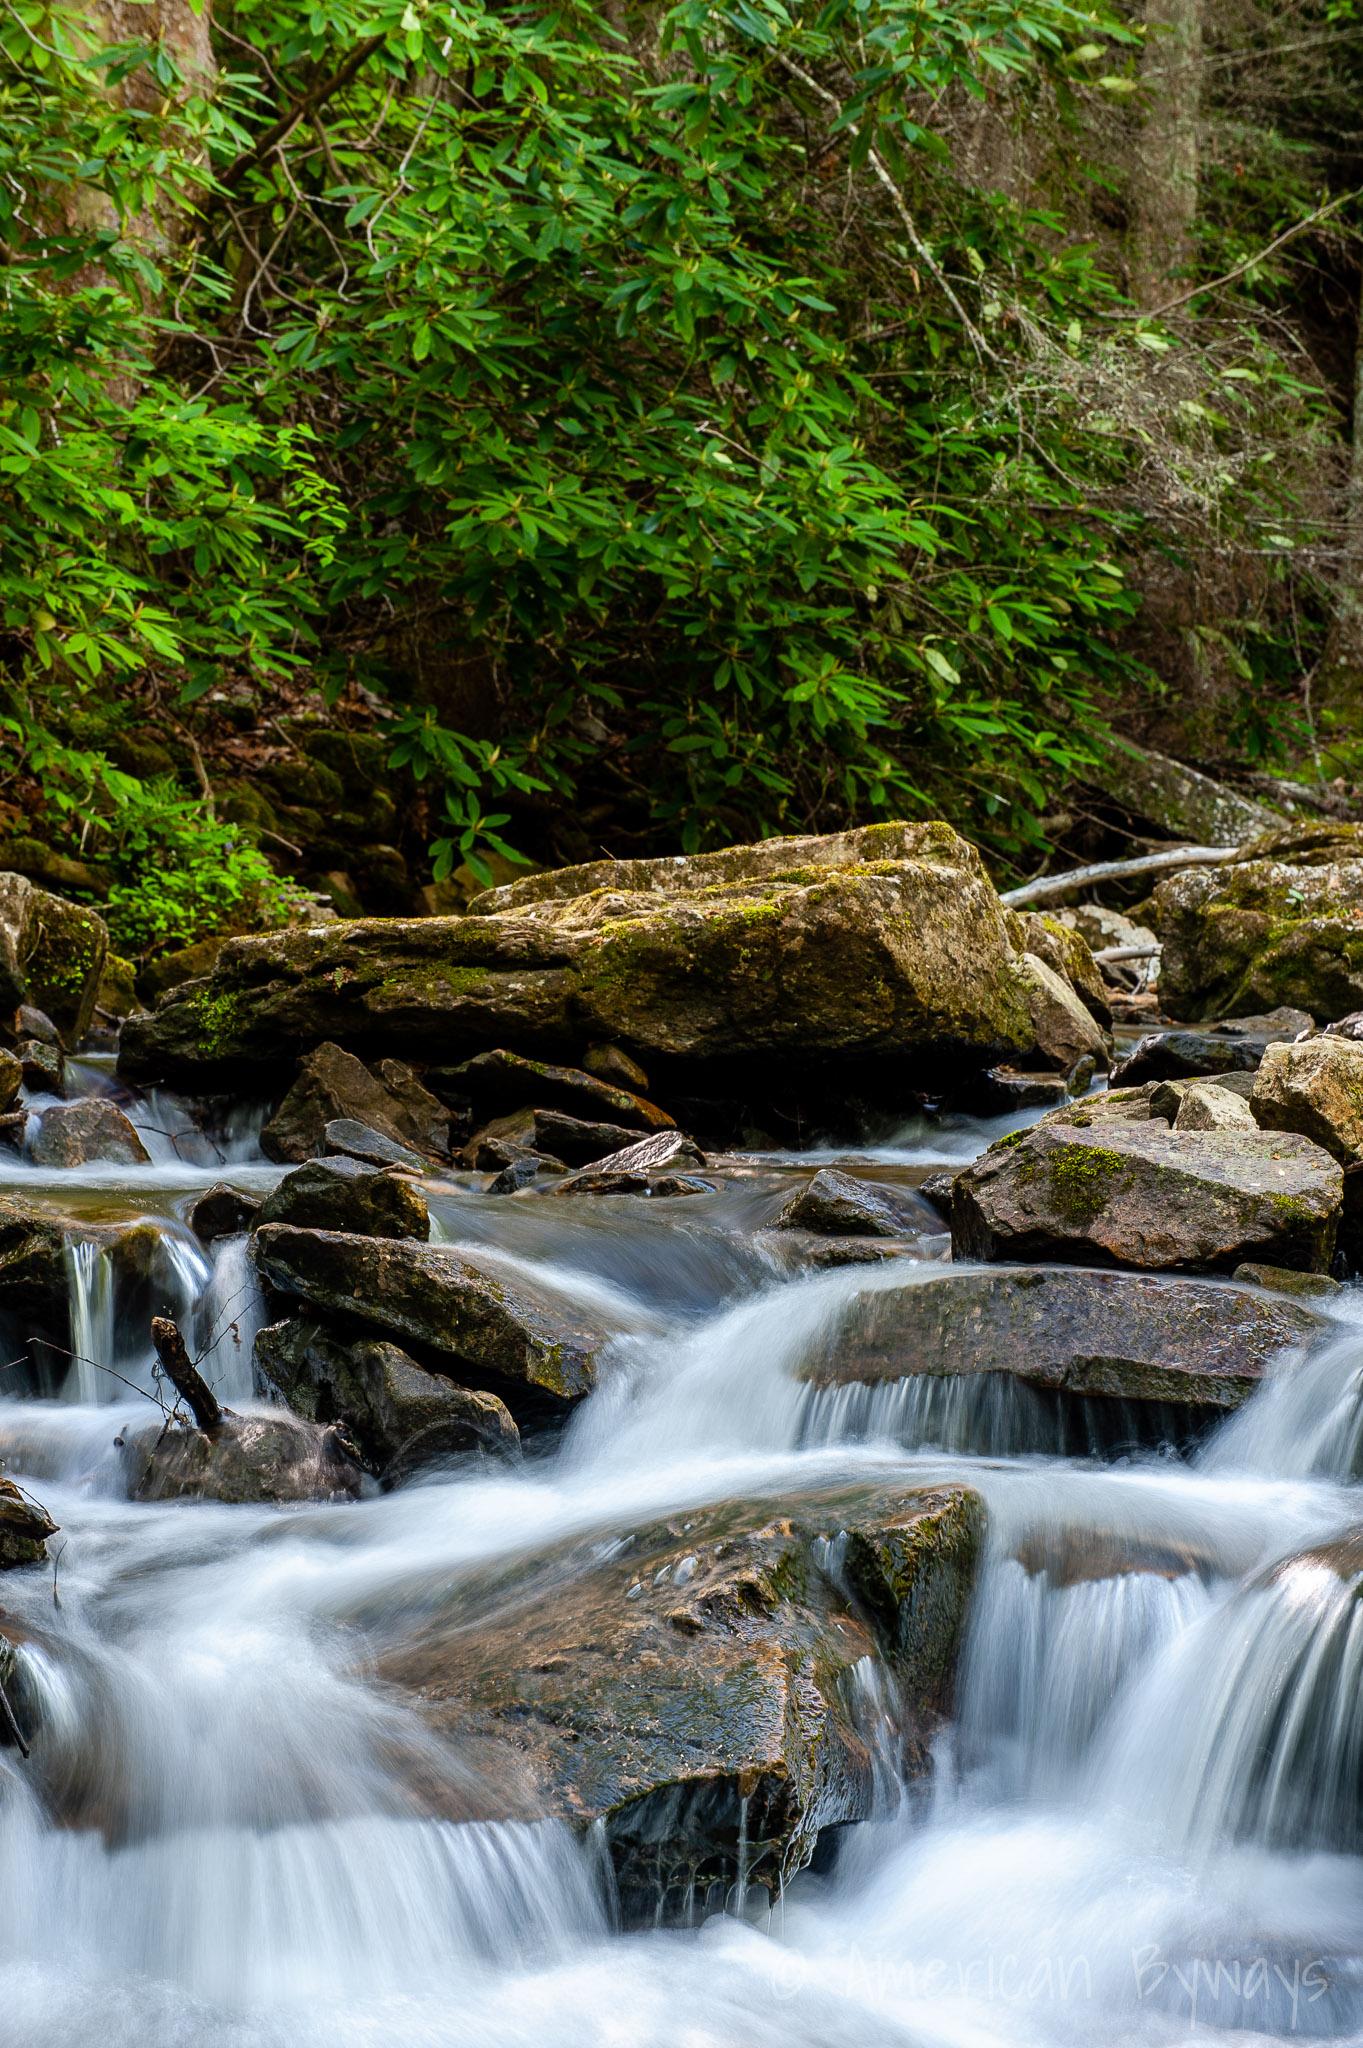 Mill Creek Cascades Hawk's Nest